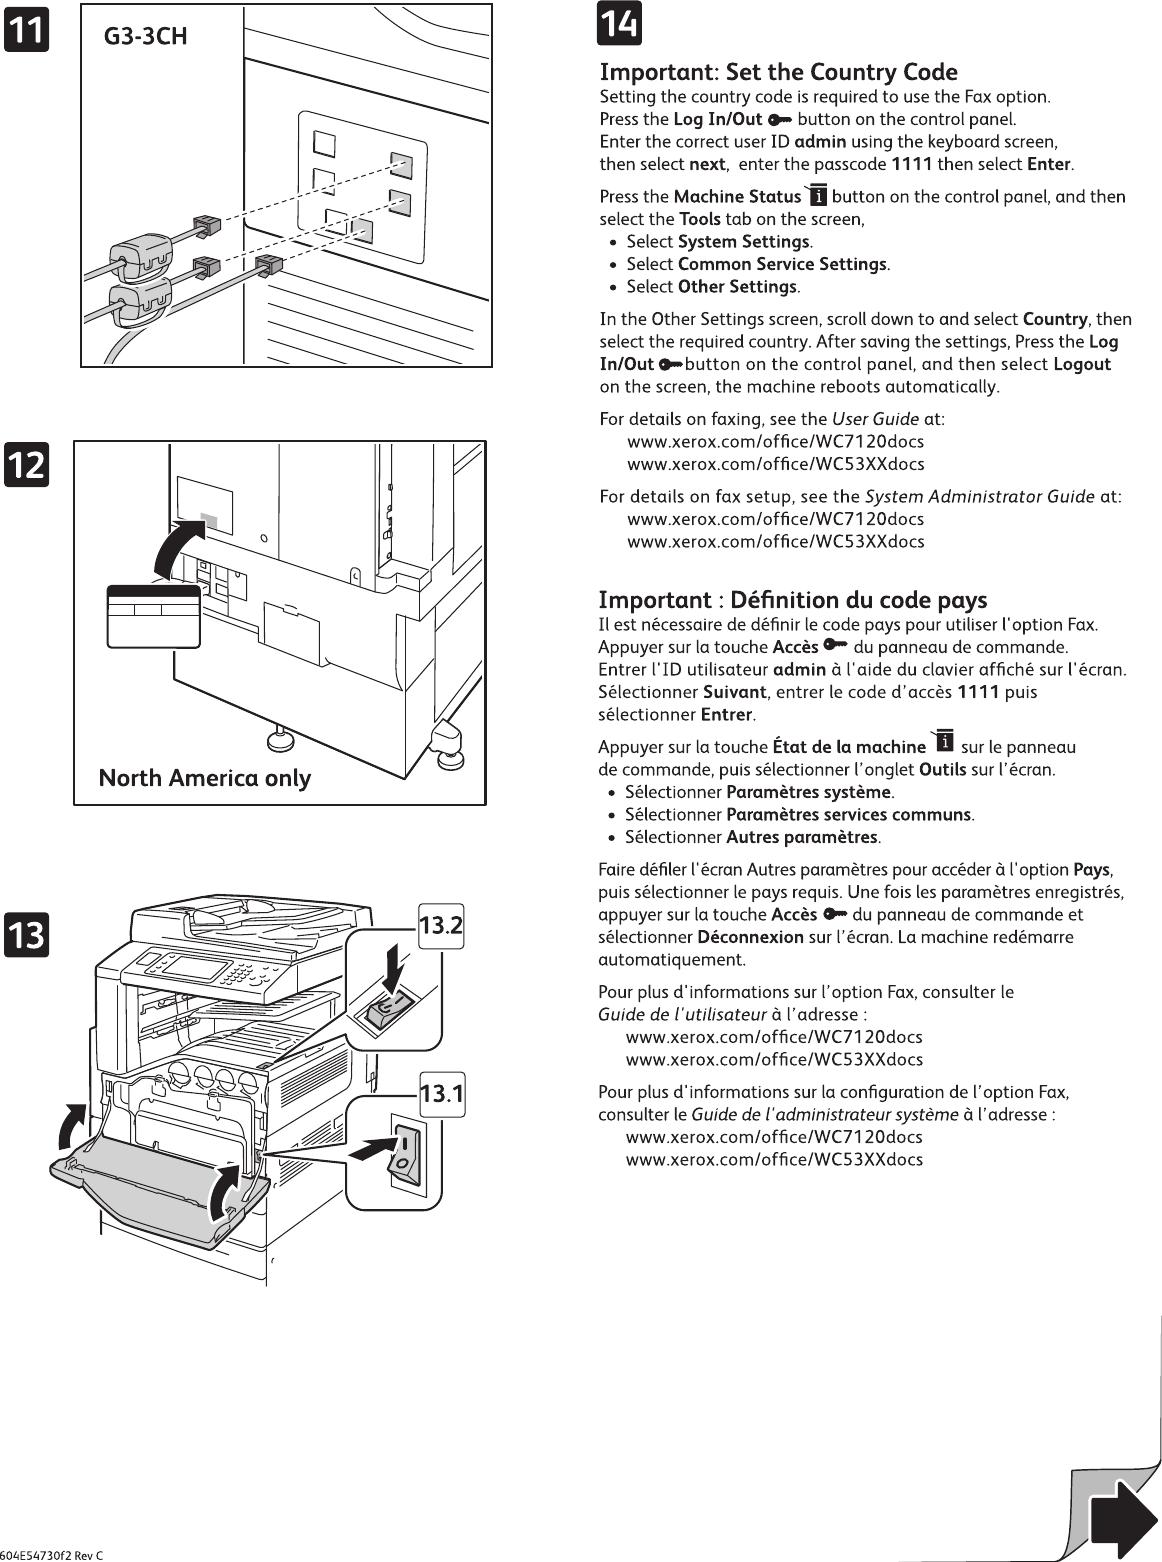 Es300 O Otomotif Manual Book Service Manual Wiring Diagram